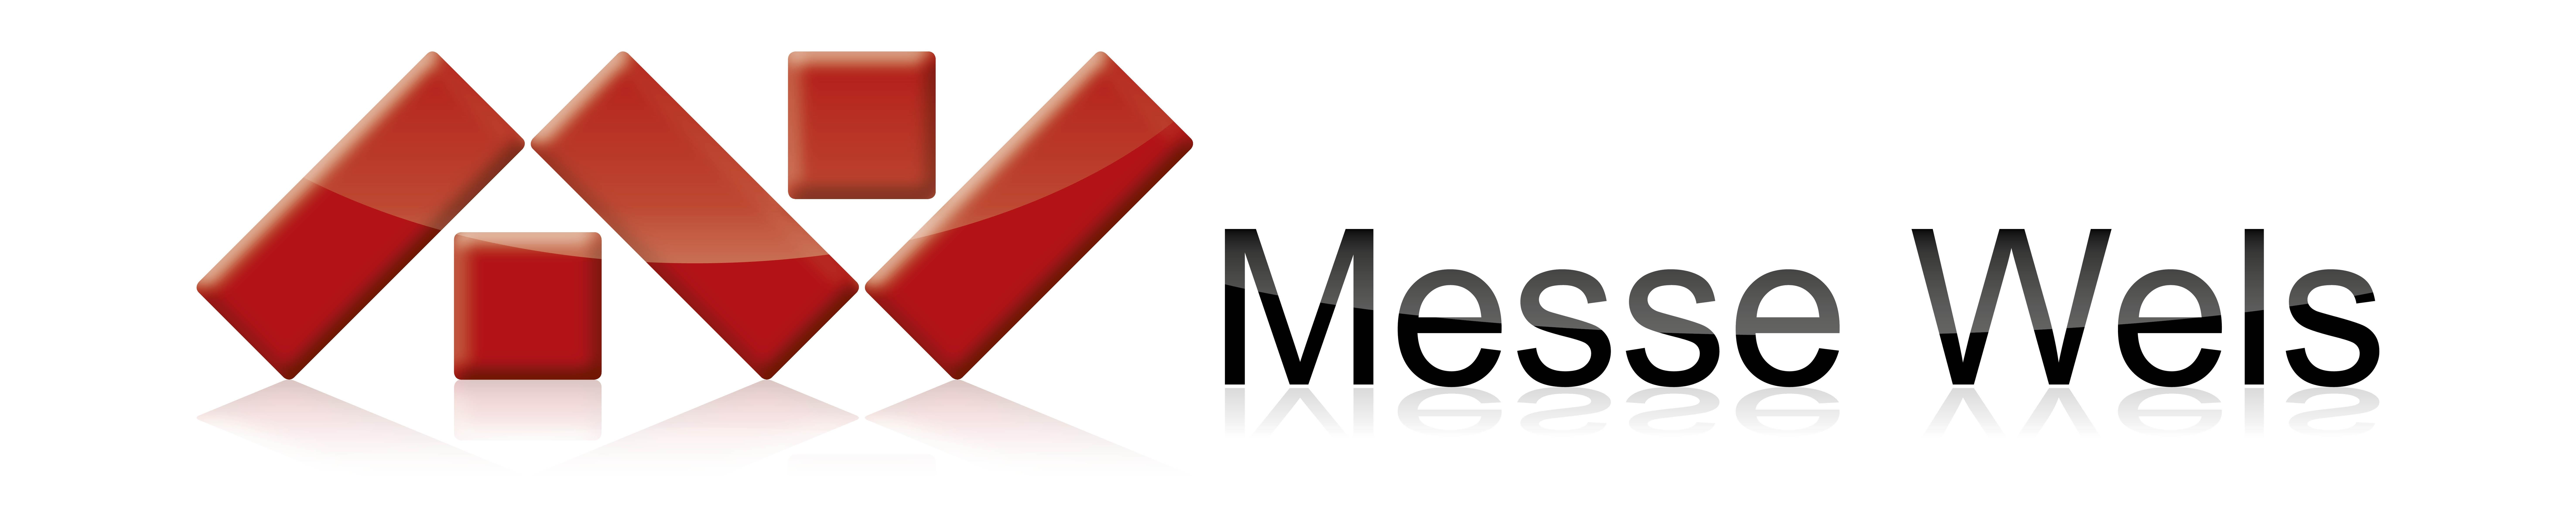 Messe Wels